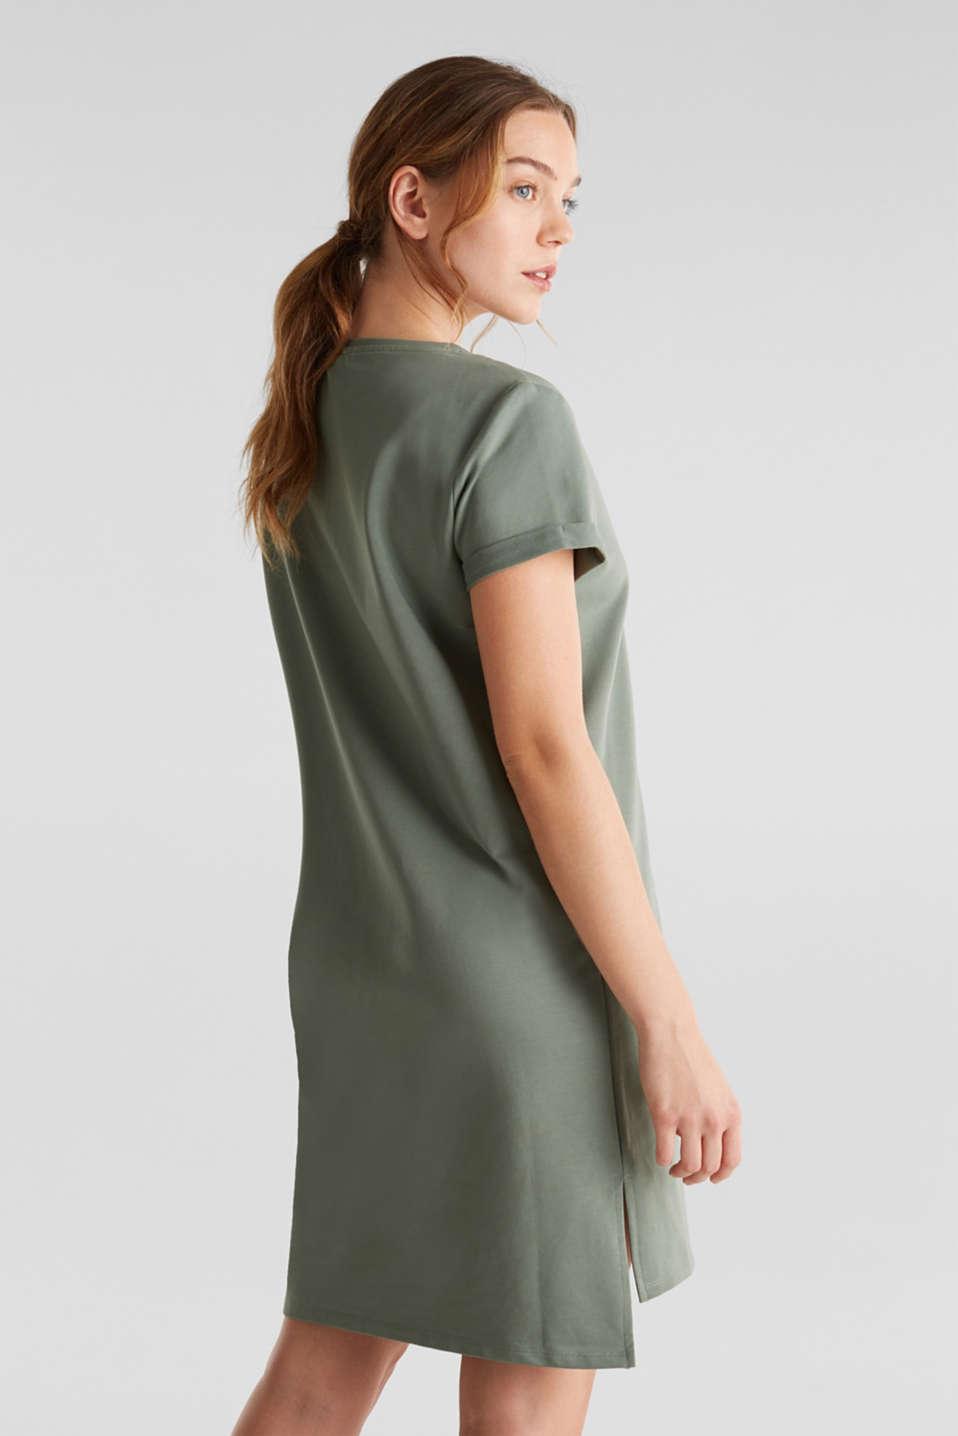 Stretch jersey dress with a high-low hem, LIGHT KHAKI, detail image number 1